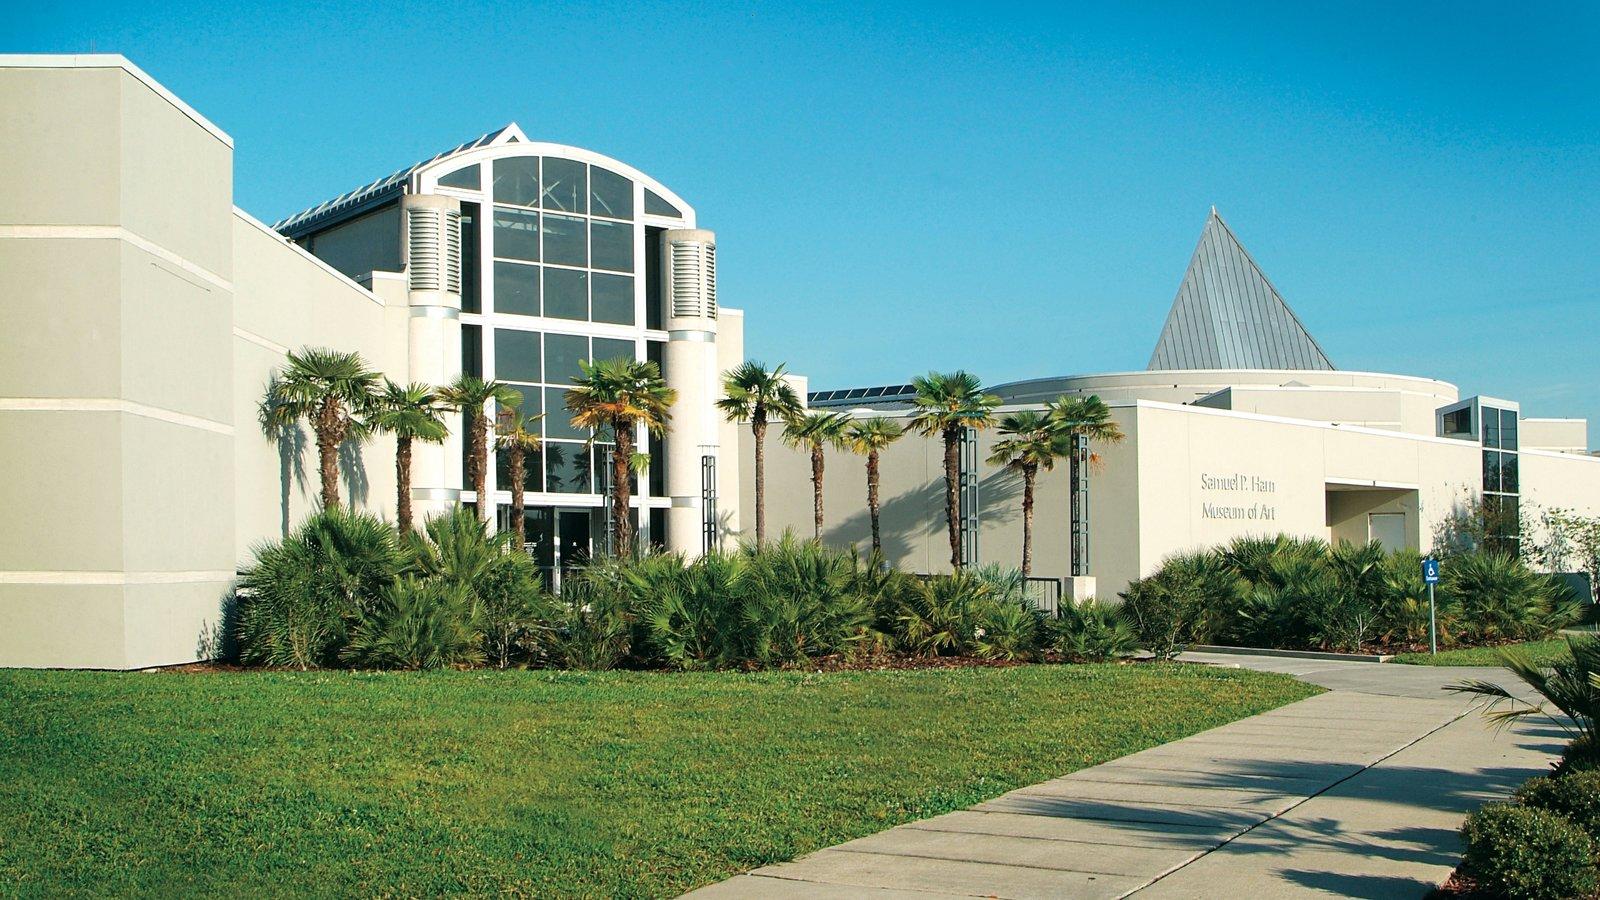 Gainesville que inclui arquitetura moderna